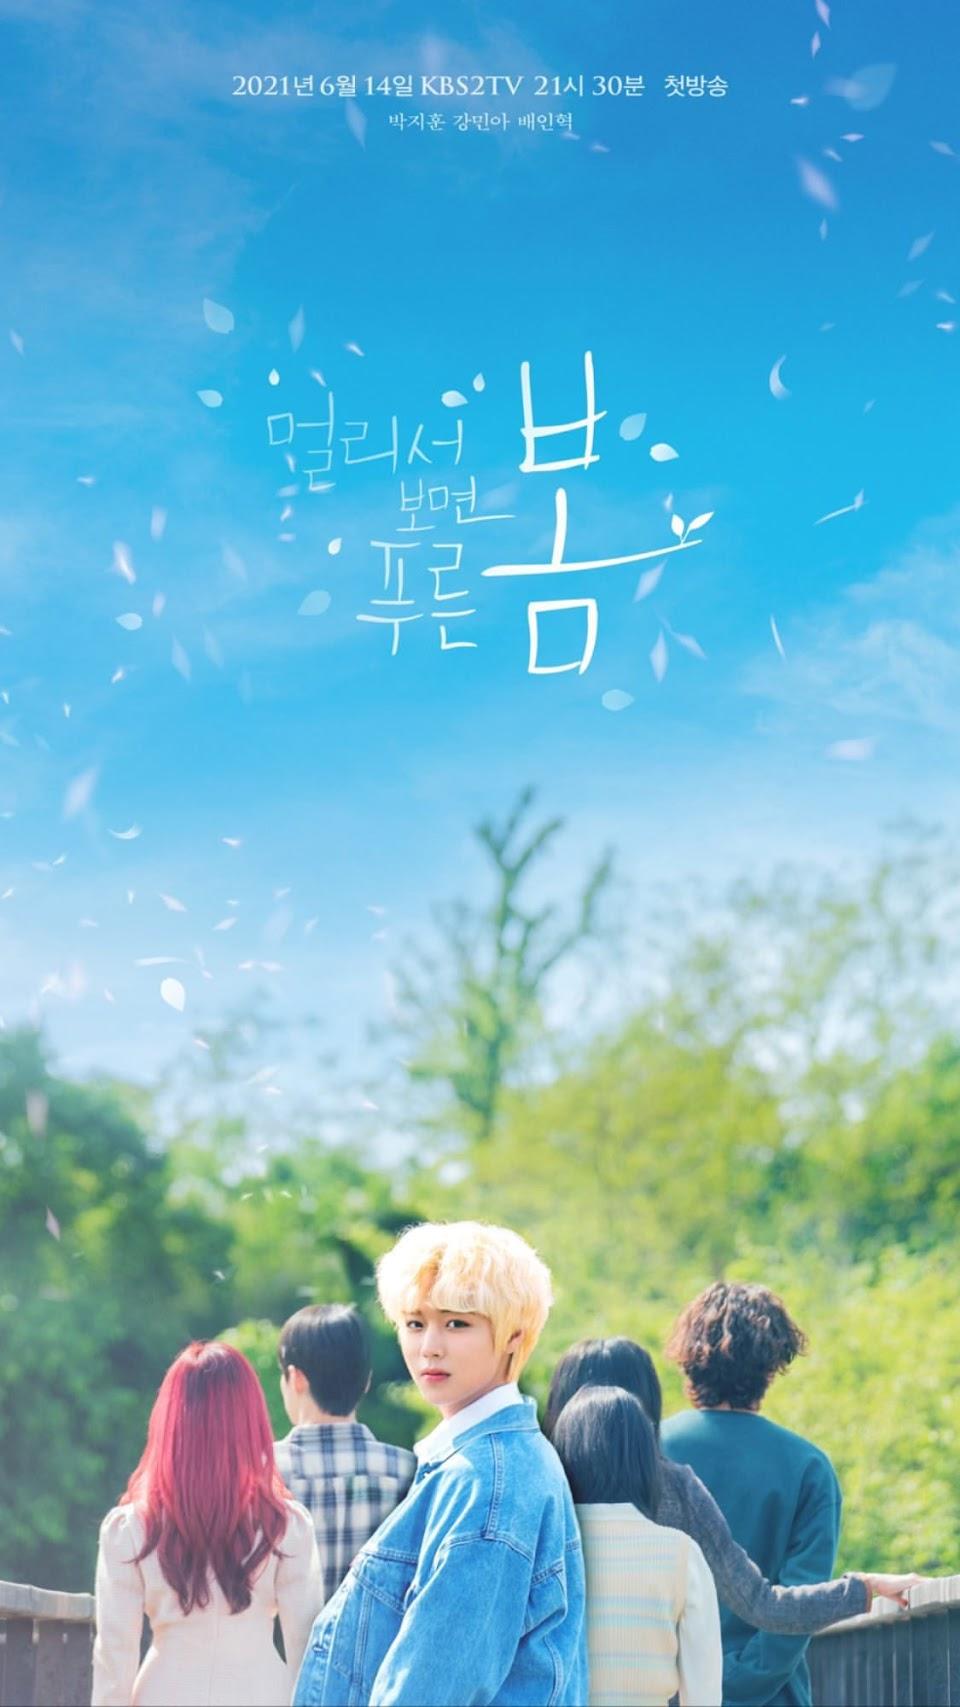 park jihoon poster